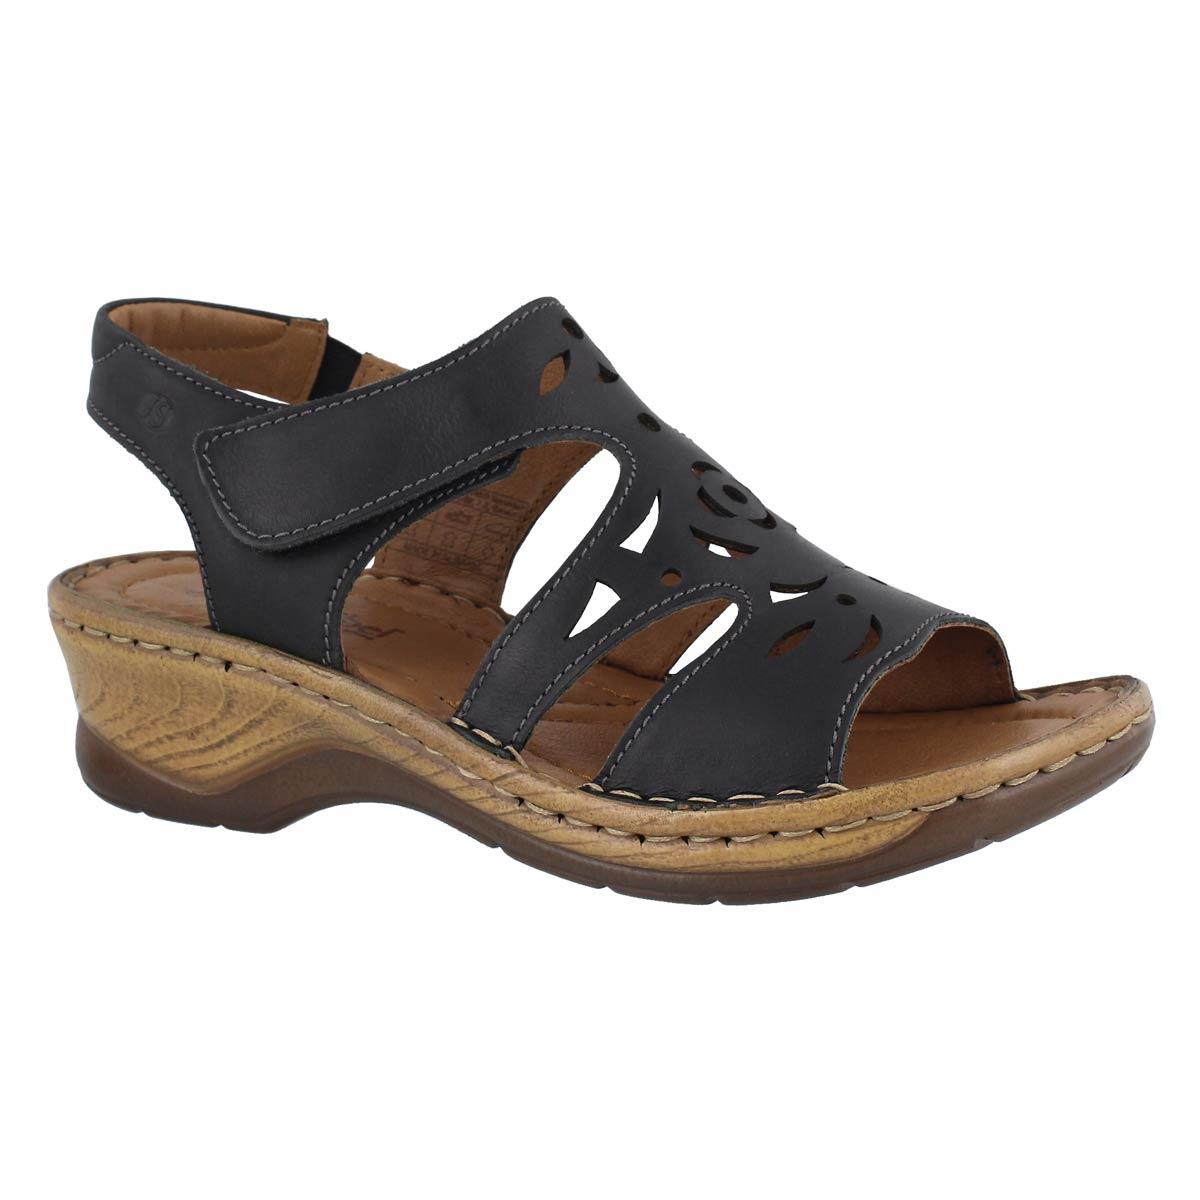 Women's CATALONIA 56 black sandals